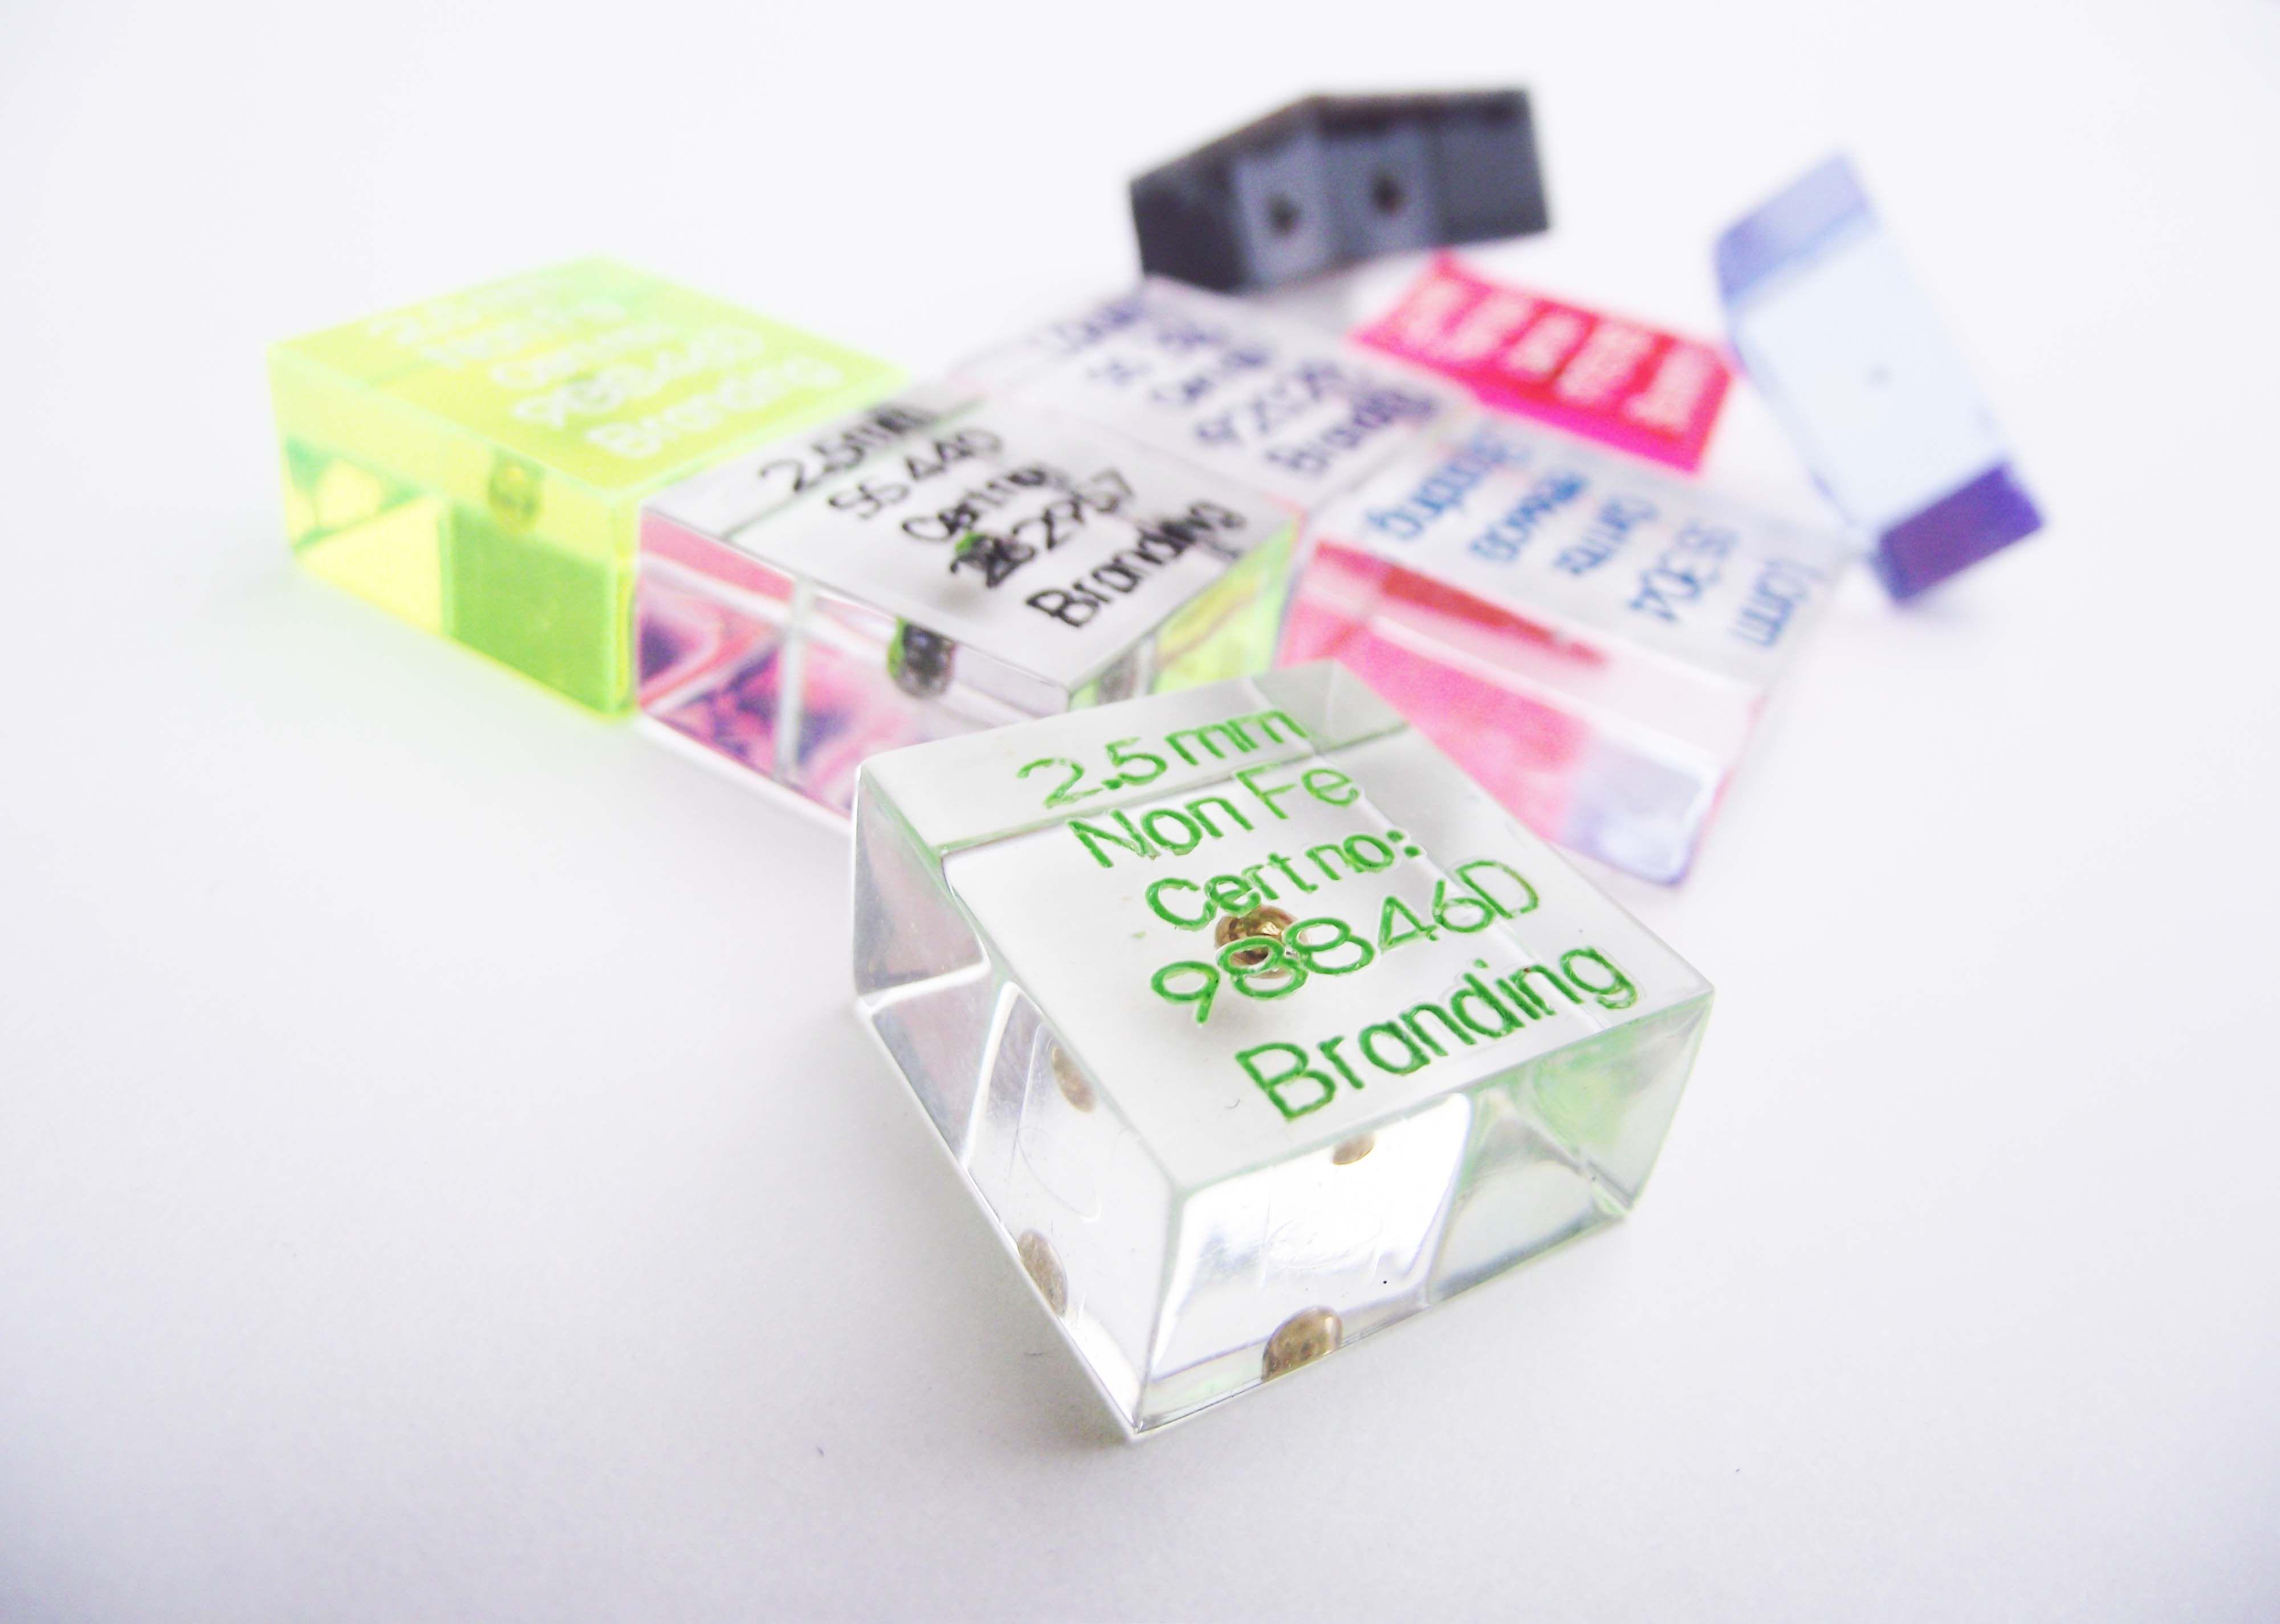 Test Squares Food Safety Test card, Metal detector, Detector